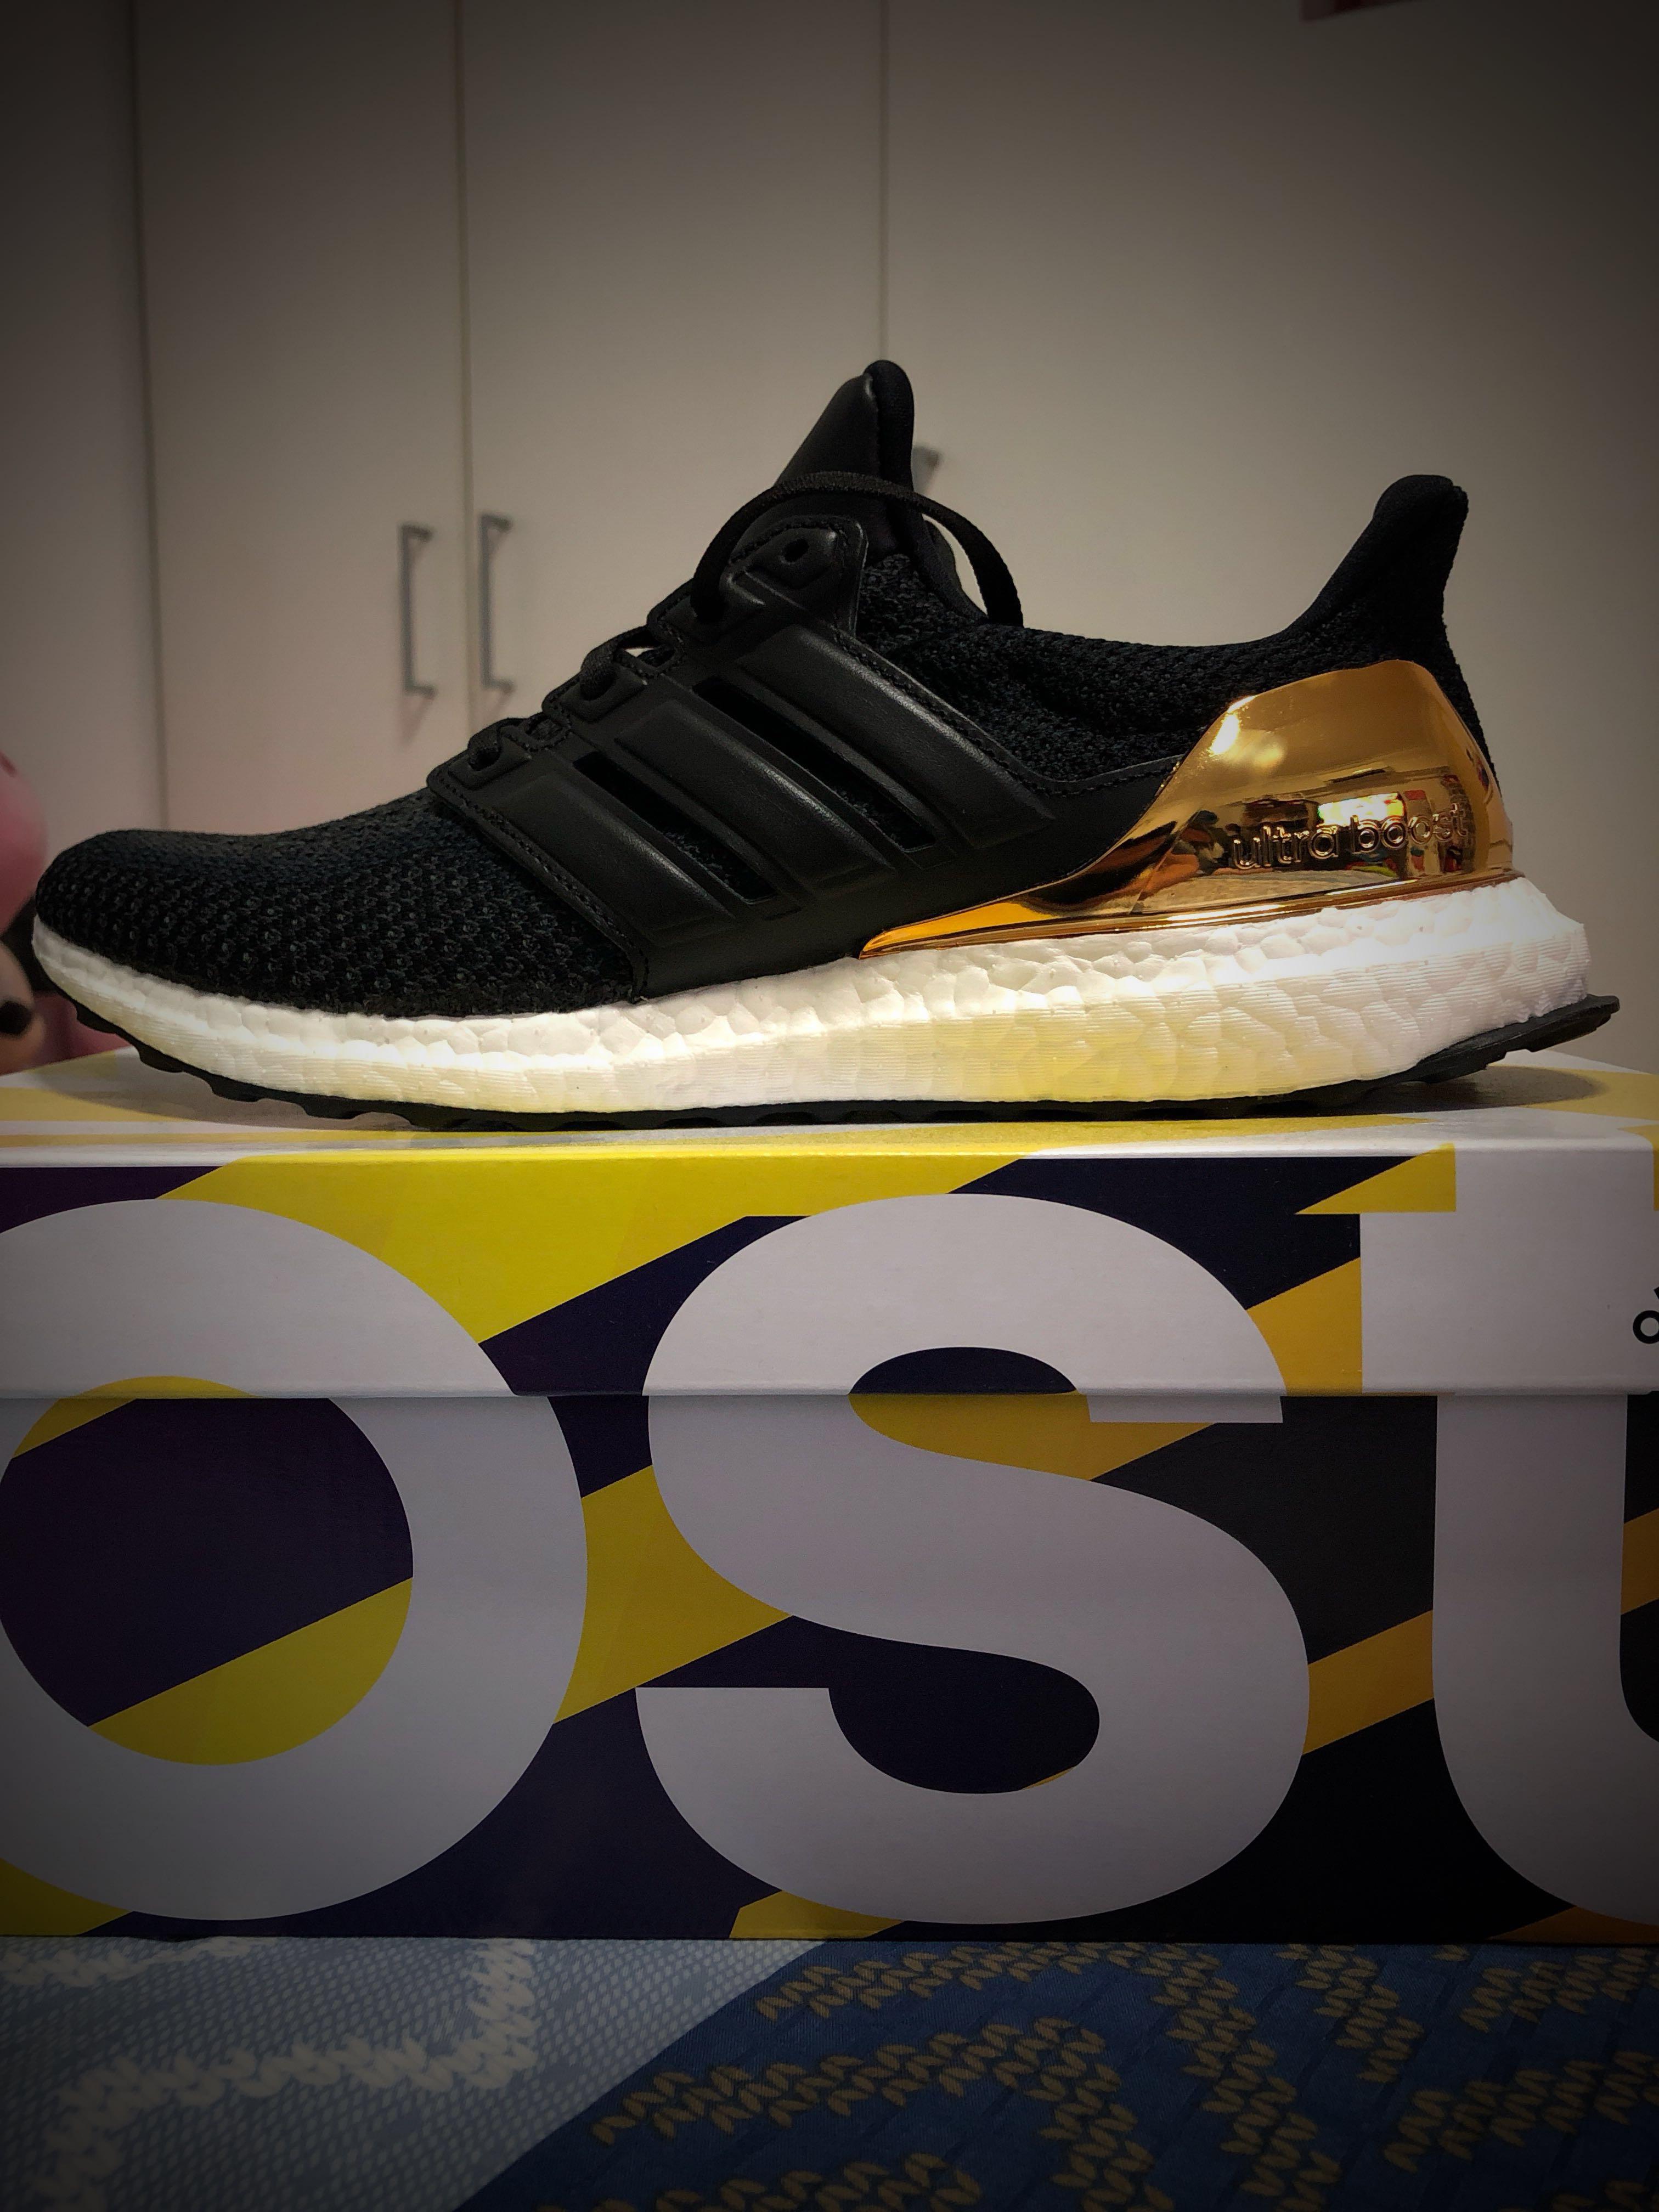 afede68c Adidas Ultra Boost LTD, Men's Fashion, Footwear, Sneakers on Carousell